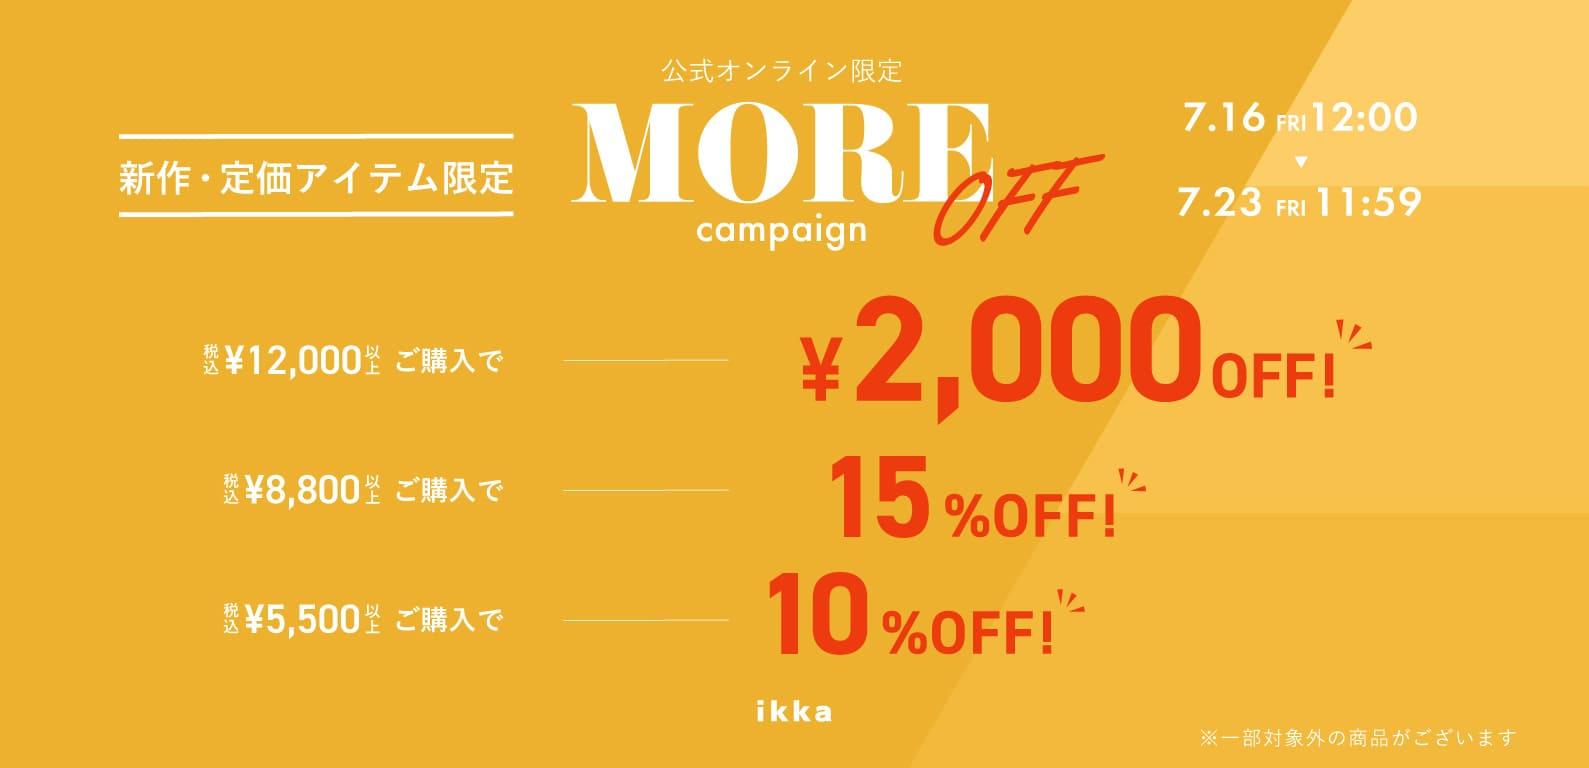 ikka | MORE OFF キャンペーン